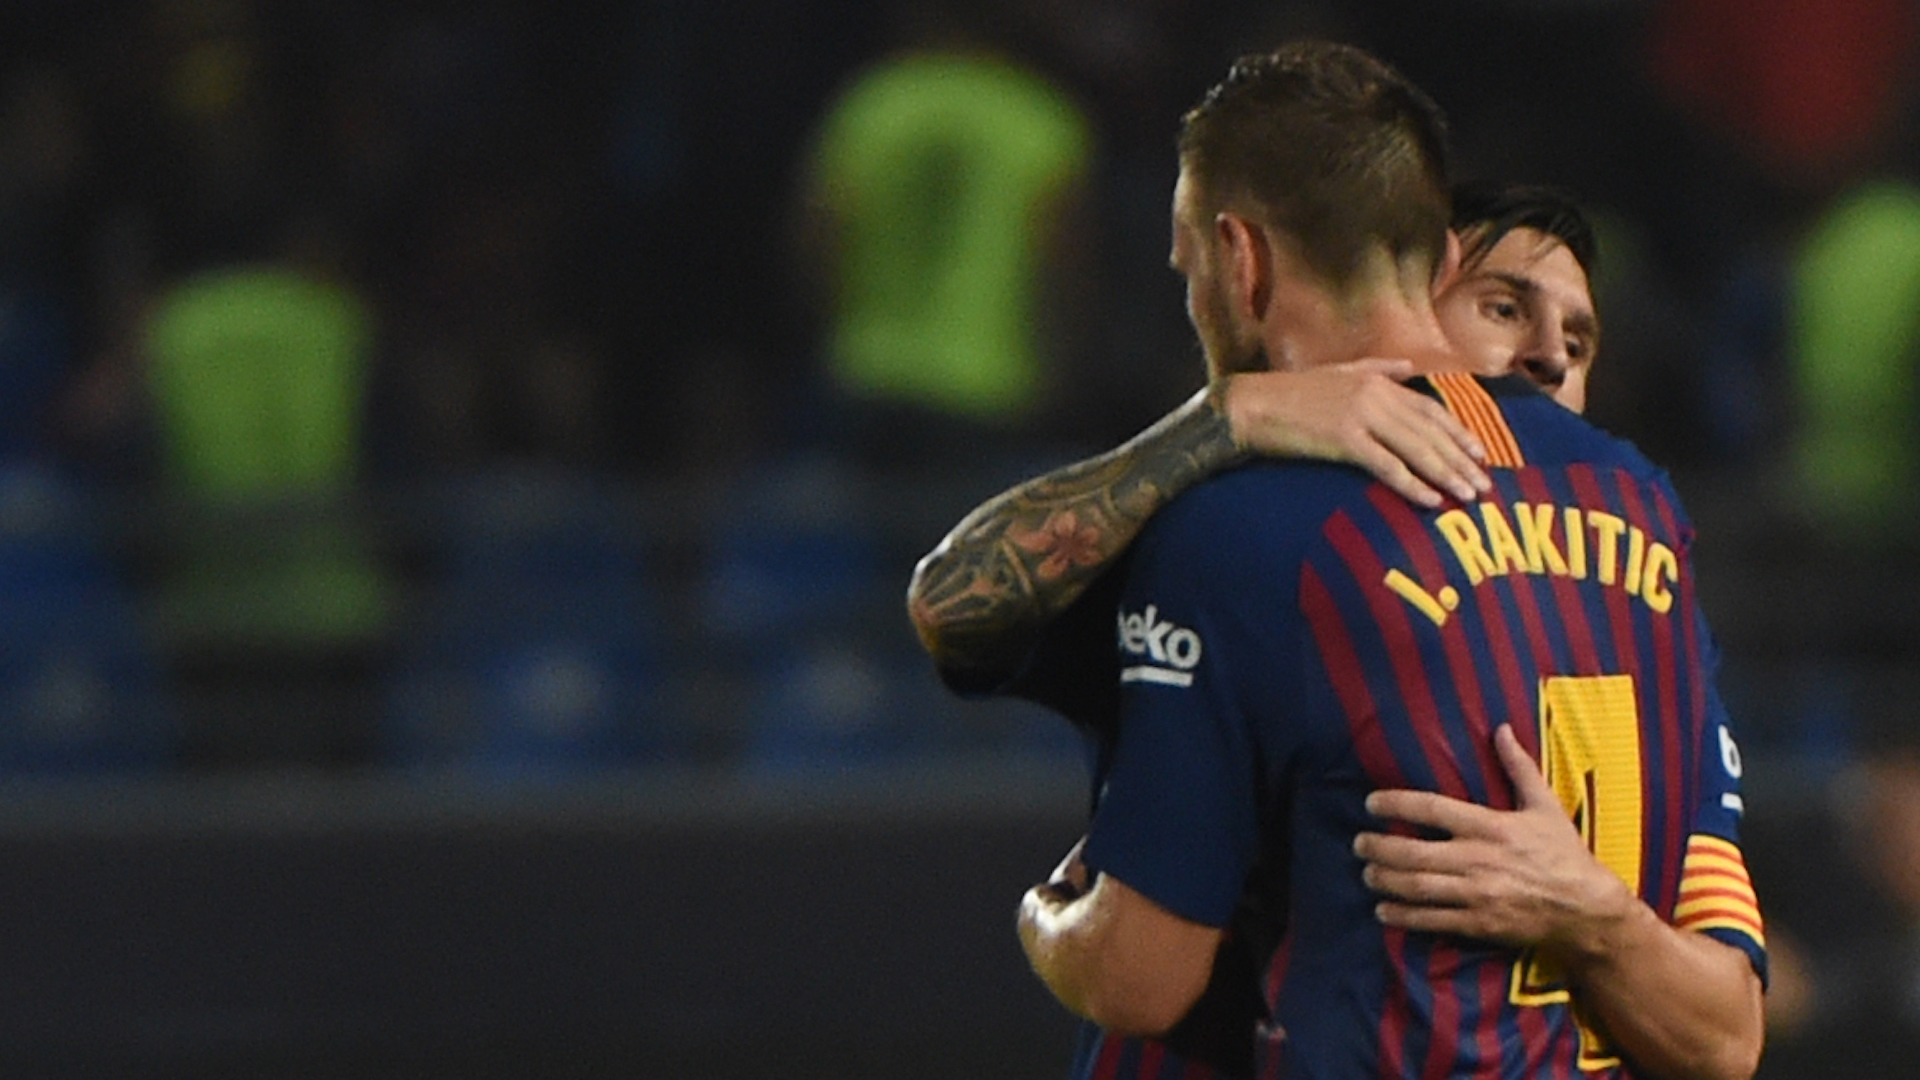 c2ab4311b7 Rakitic recebe o abrao de Messi após gol sobre o PSV (Foto  Getty Images)